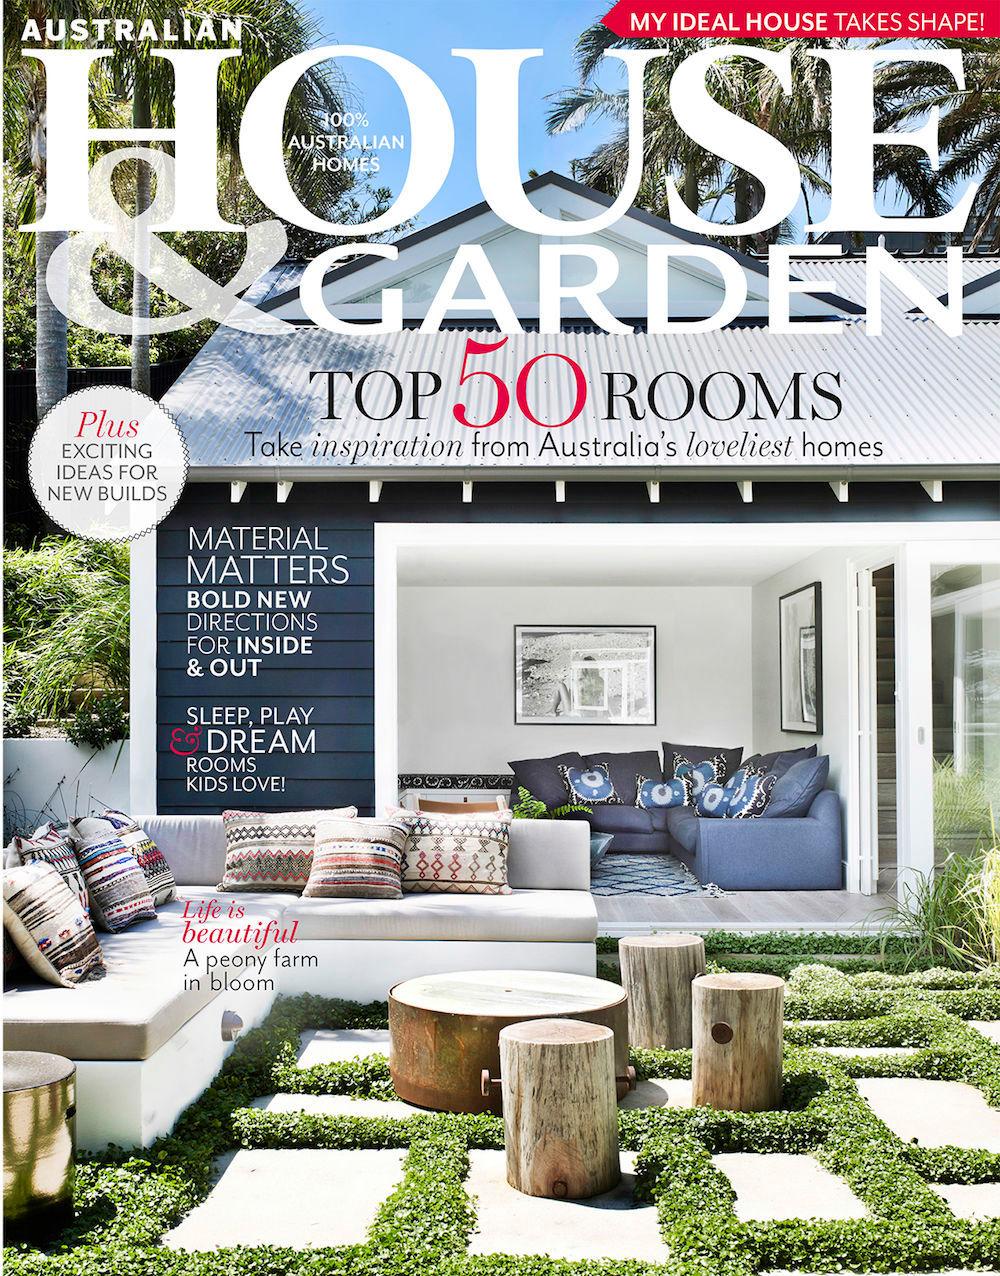 robson-rak-architects-house-garden-november-2017-01.jpg